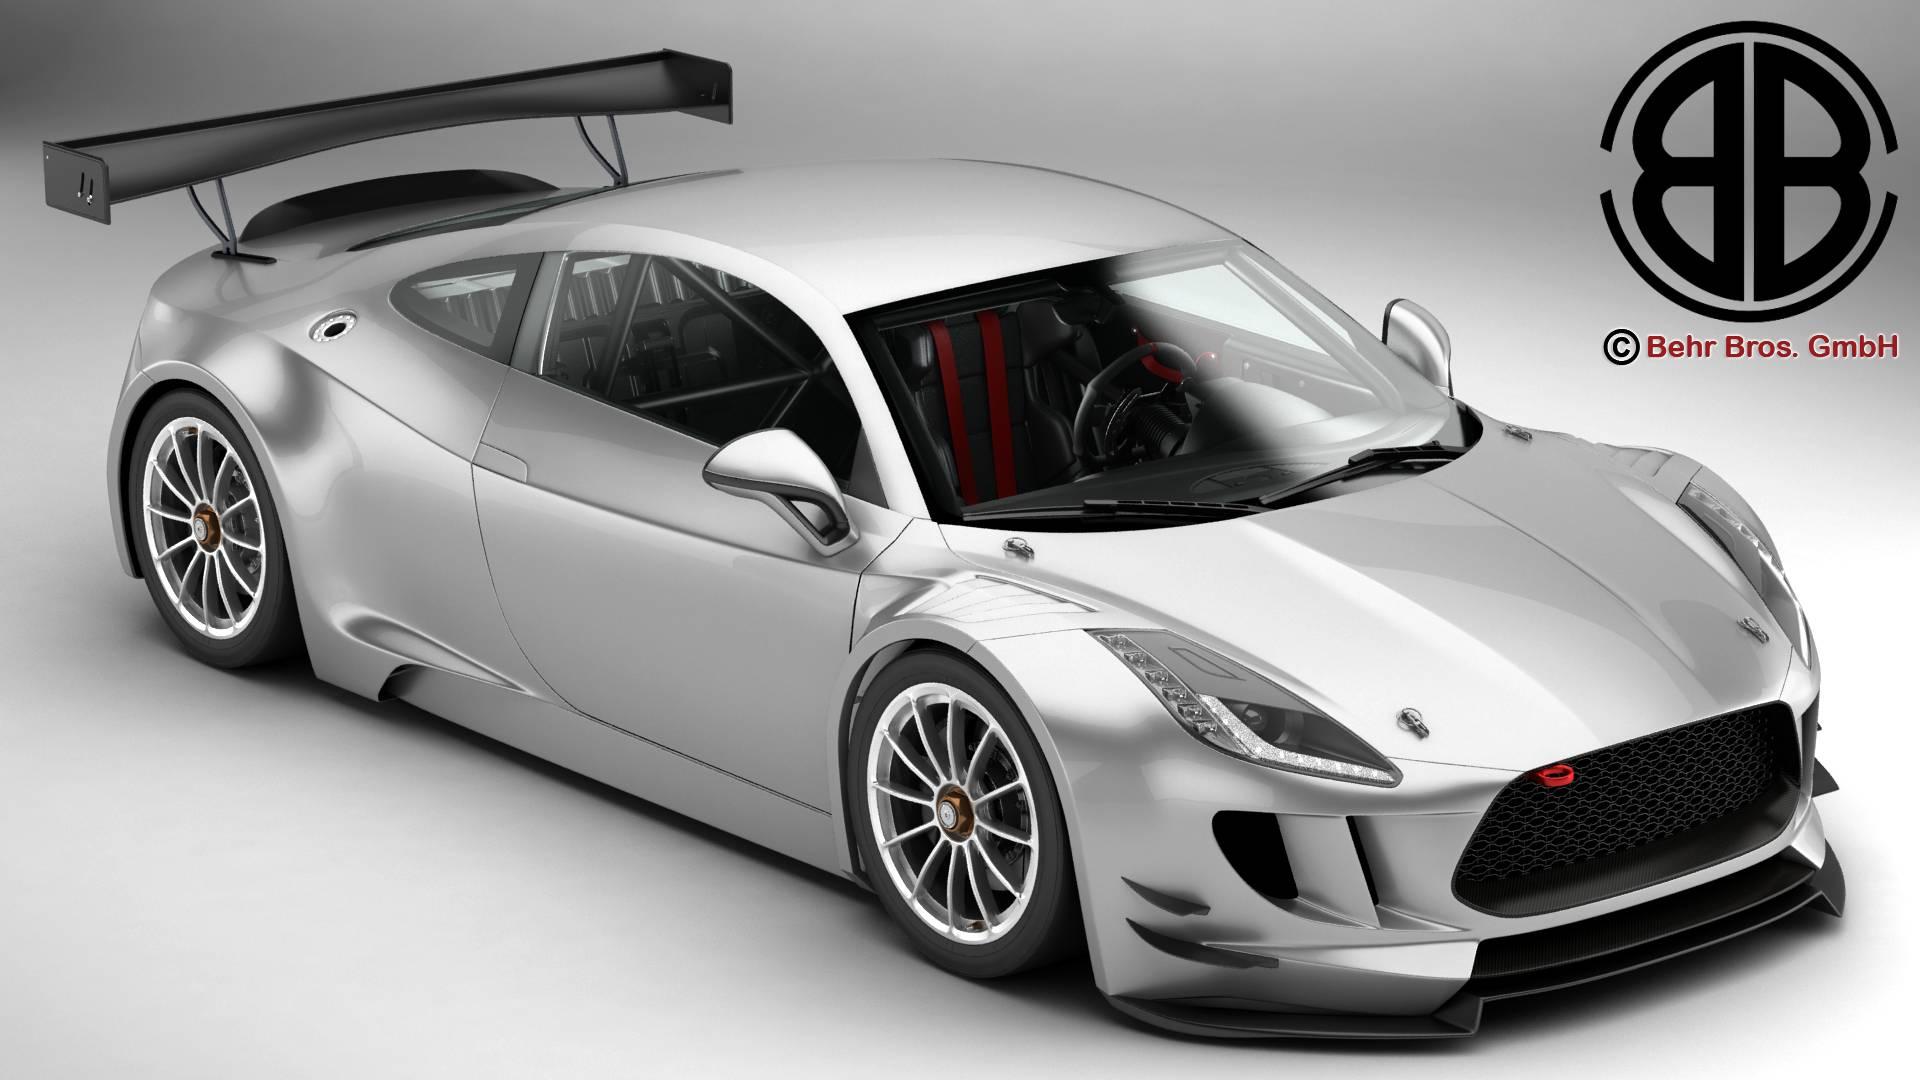 generic sports car gt3 3d model 3ds max fbx c4d lwo ma mb obj 219935